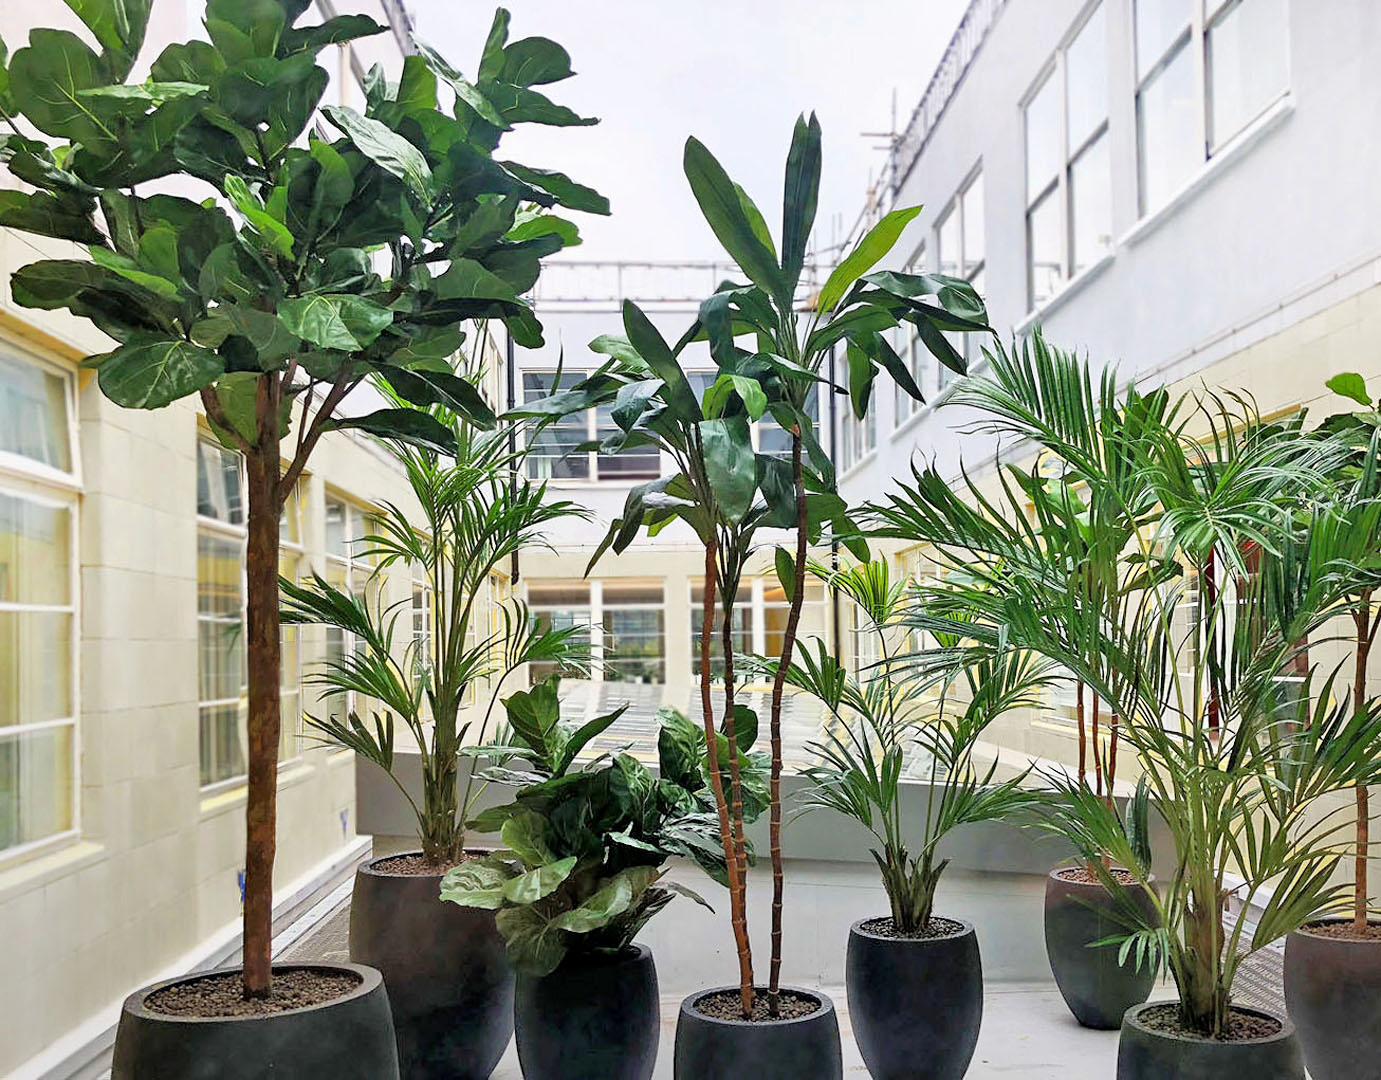 712 fake landscapes cool courtyard tree mix lyrata cordyline and palm at Selfridges